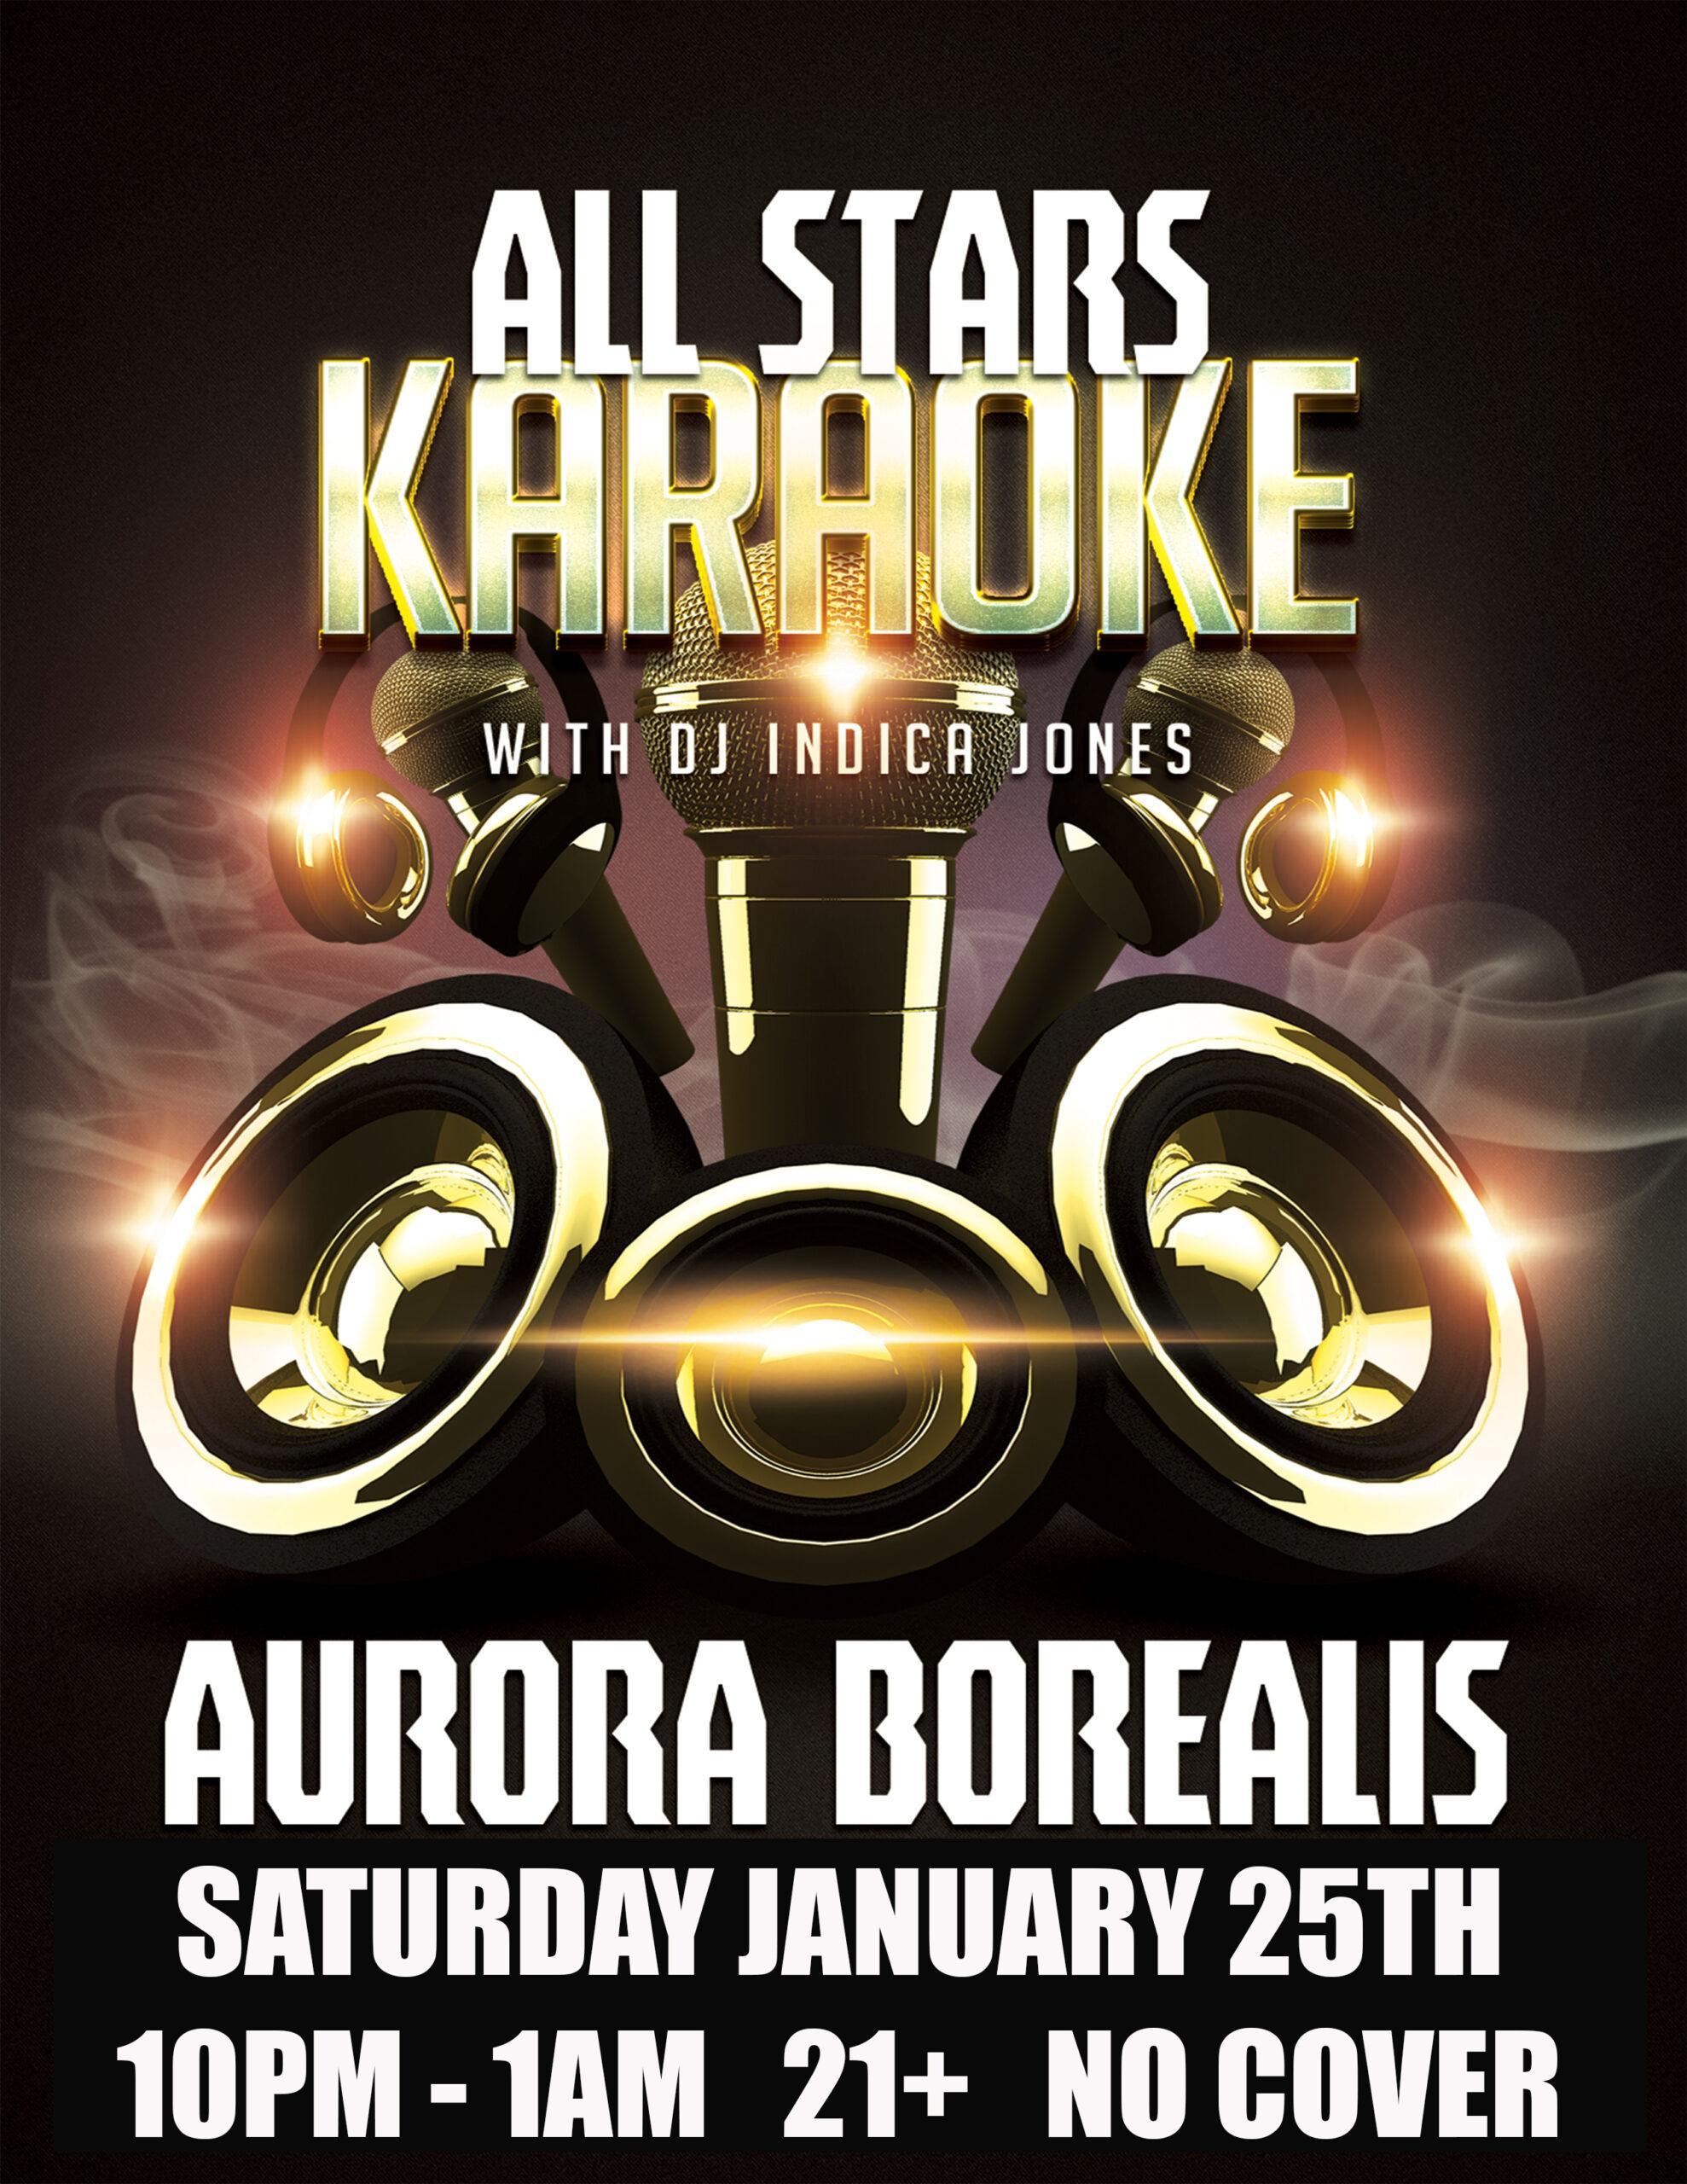 All Stars Karaoke!